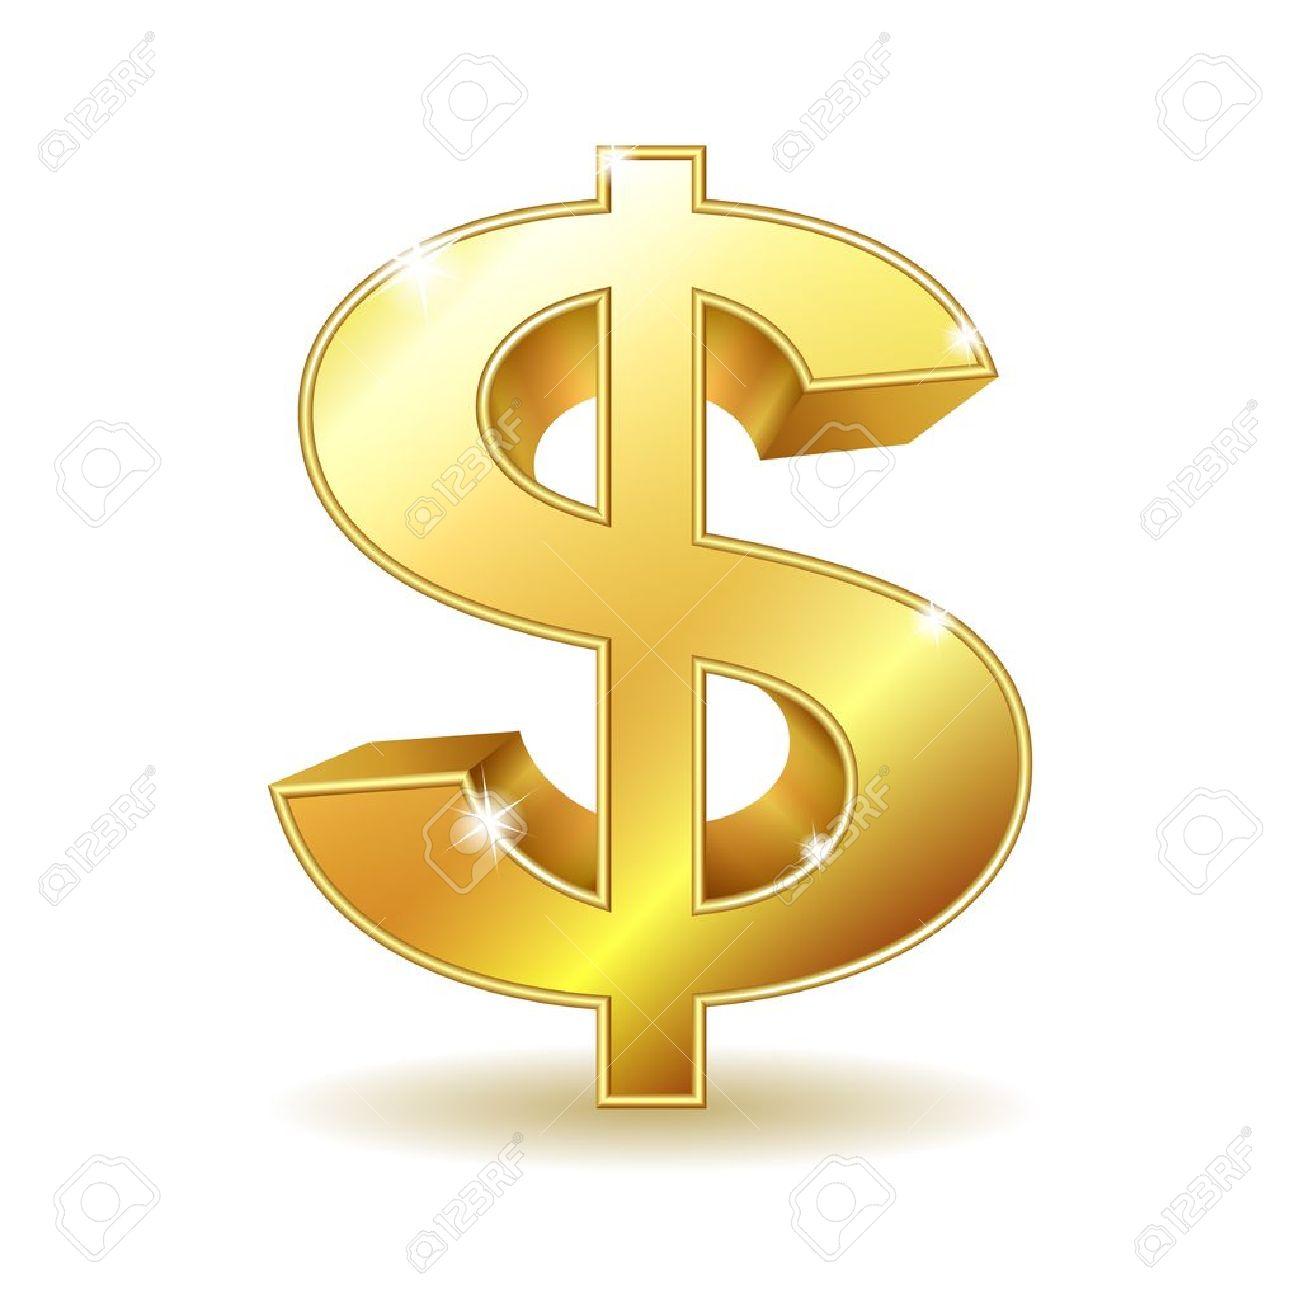 Golden Dollar Sign Isolated On White Background Illustration.